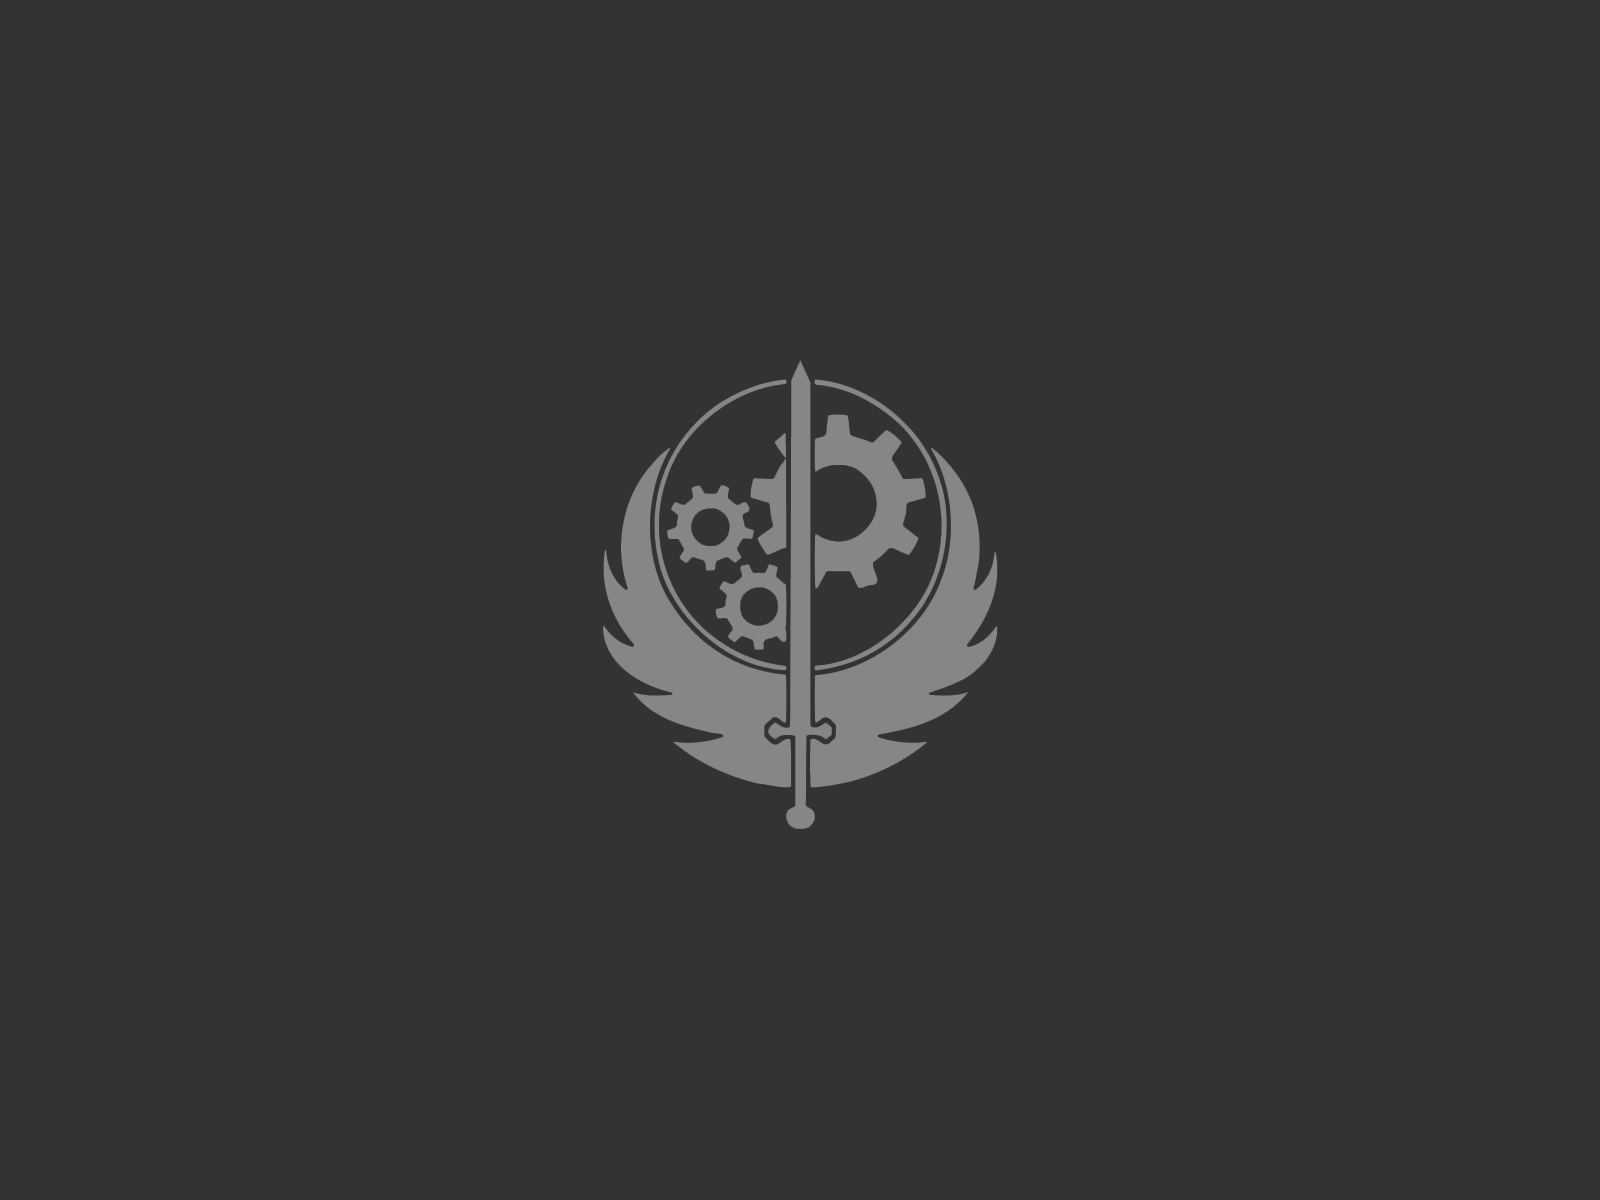 46 Fallout Logo Wallpaper On Wallpapersafari